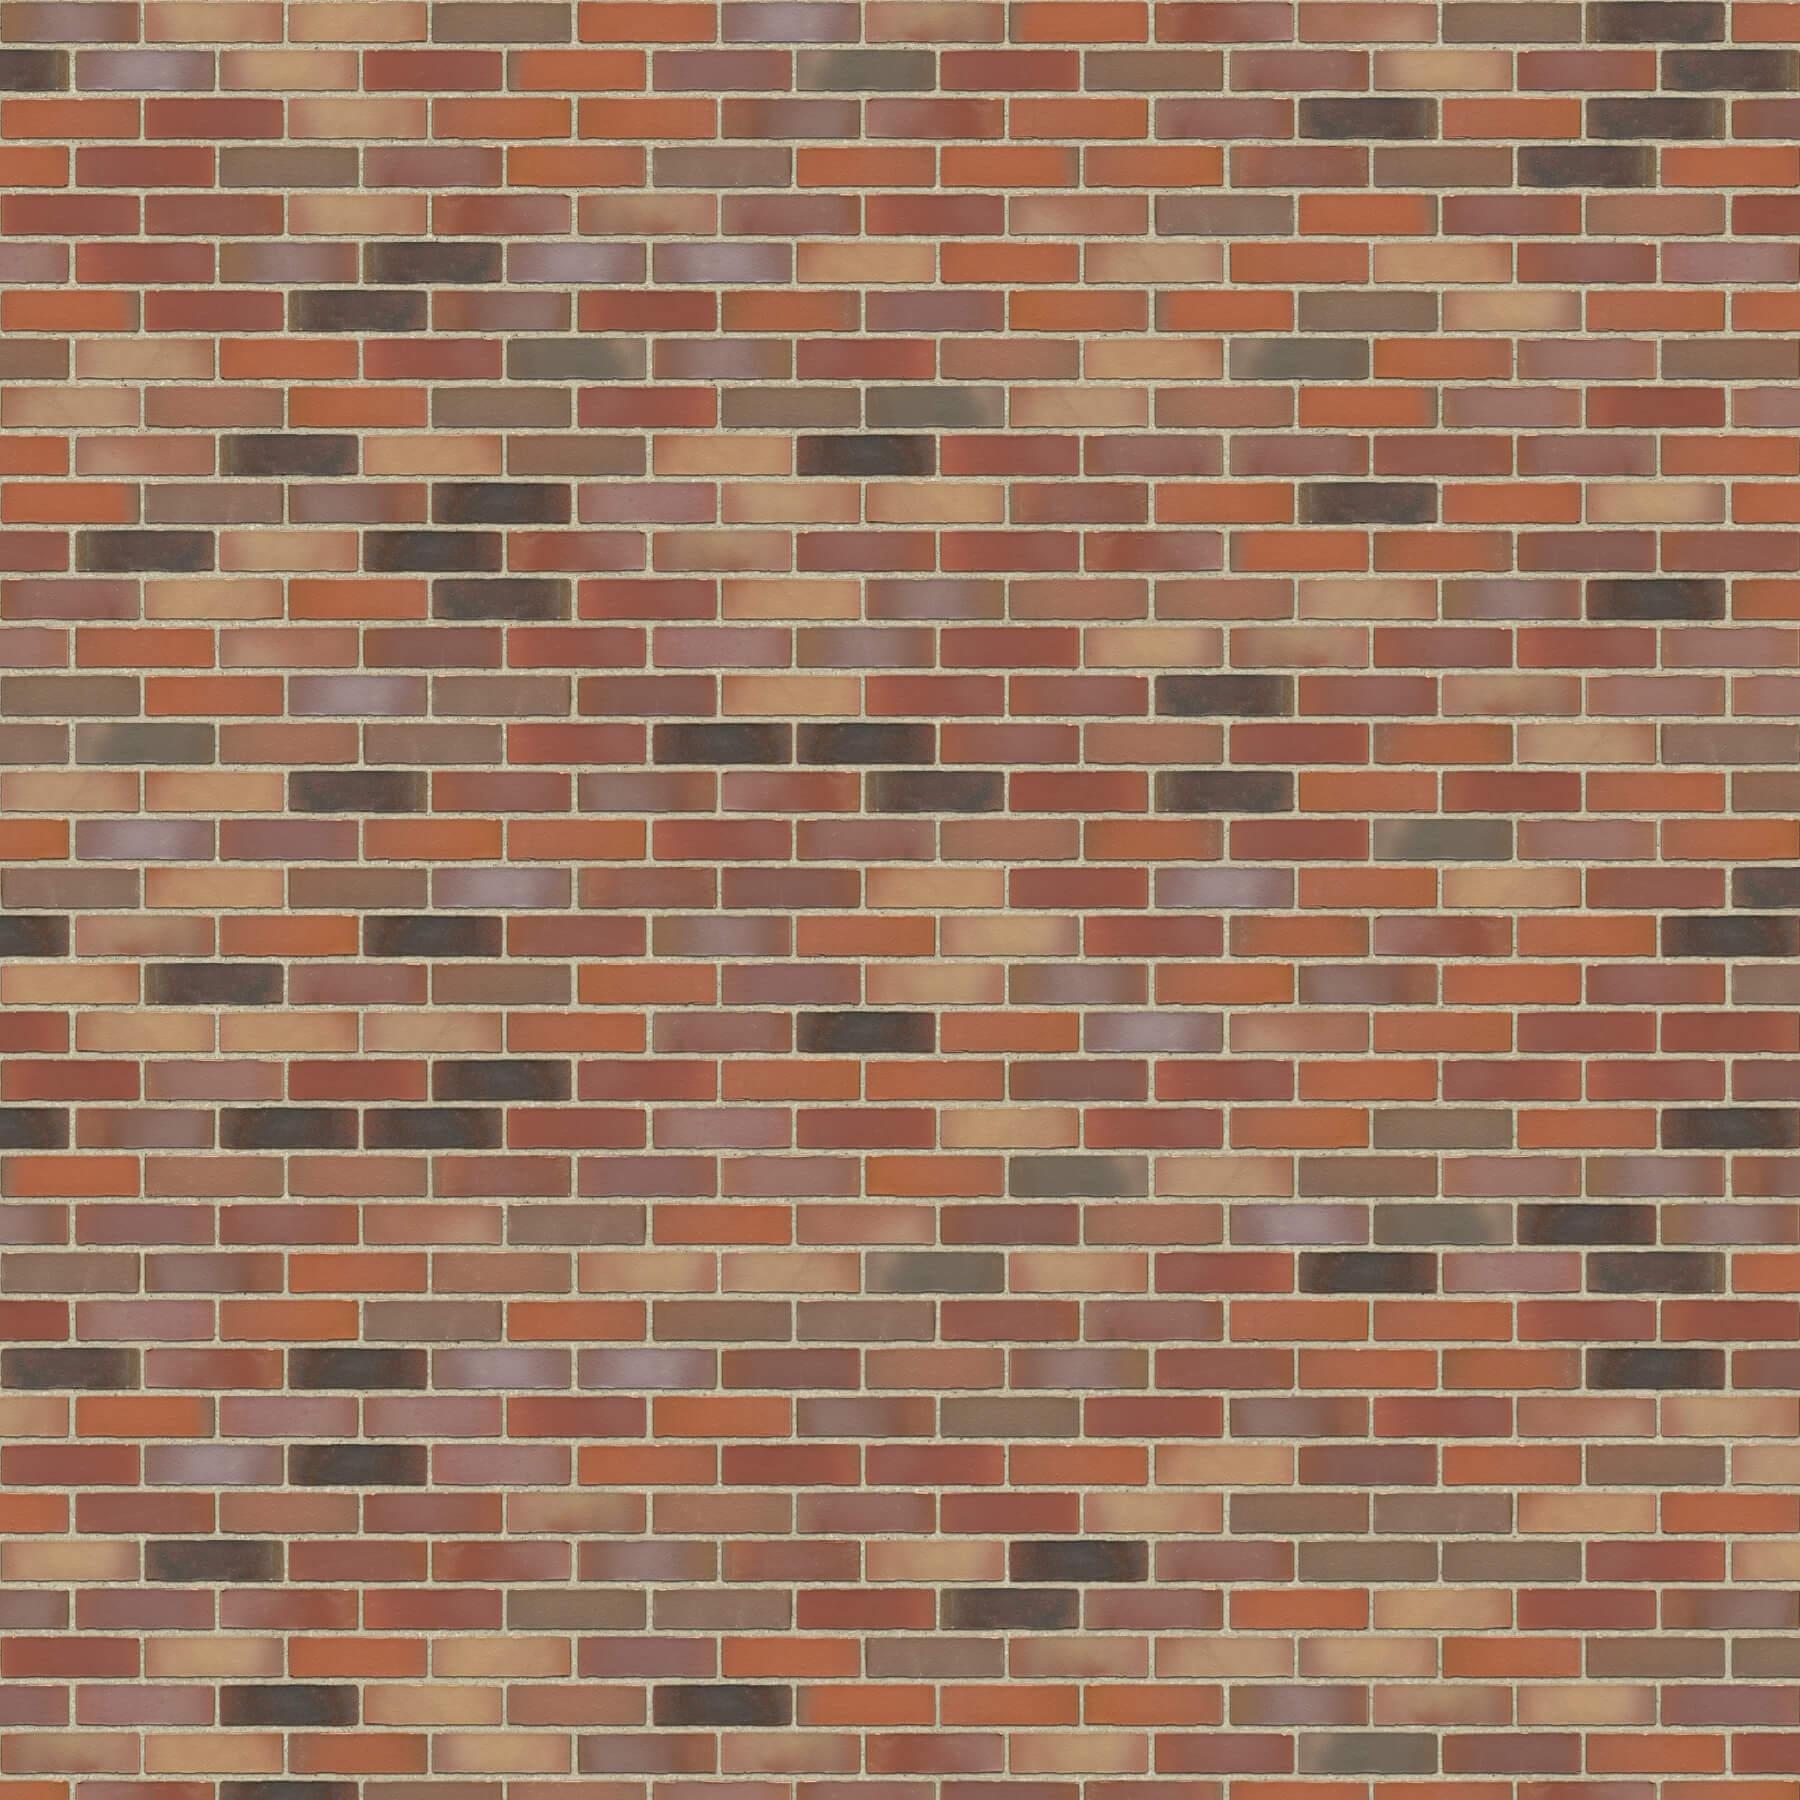 Puna-cigla-FeldHaus-Klinker-brick-house-beograd-nf-k-991-Bez Fuga